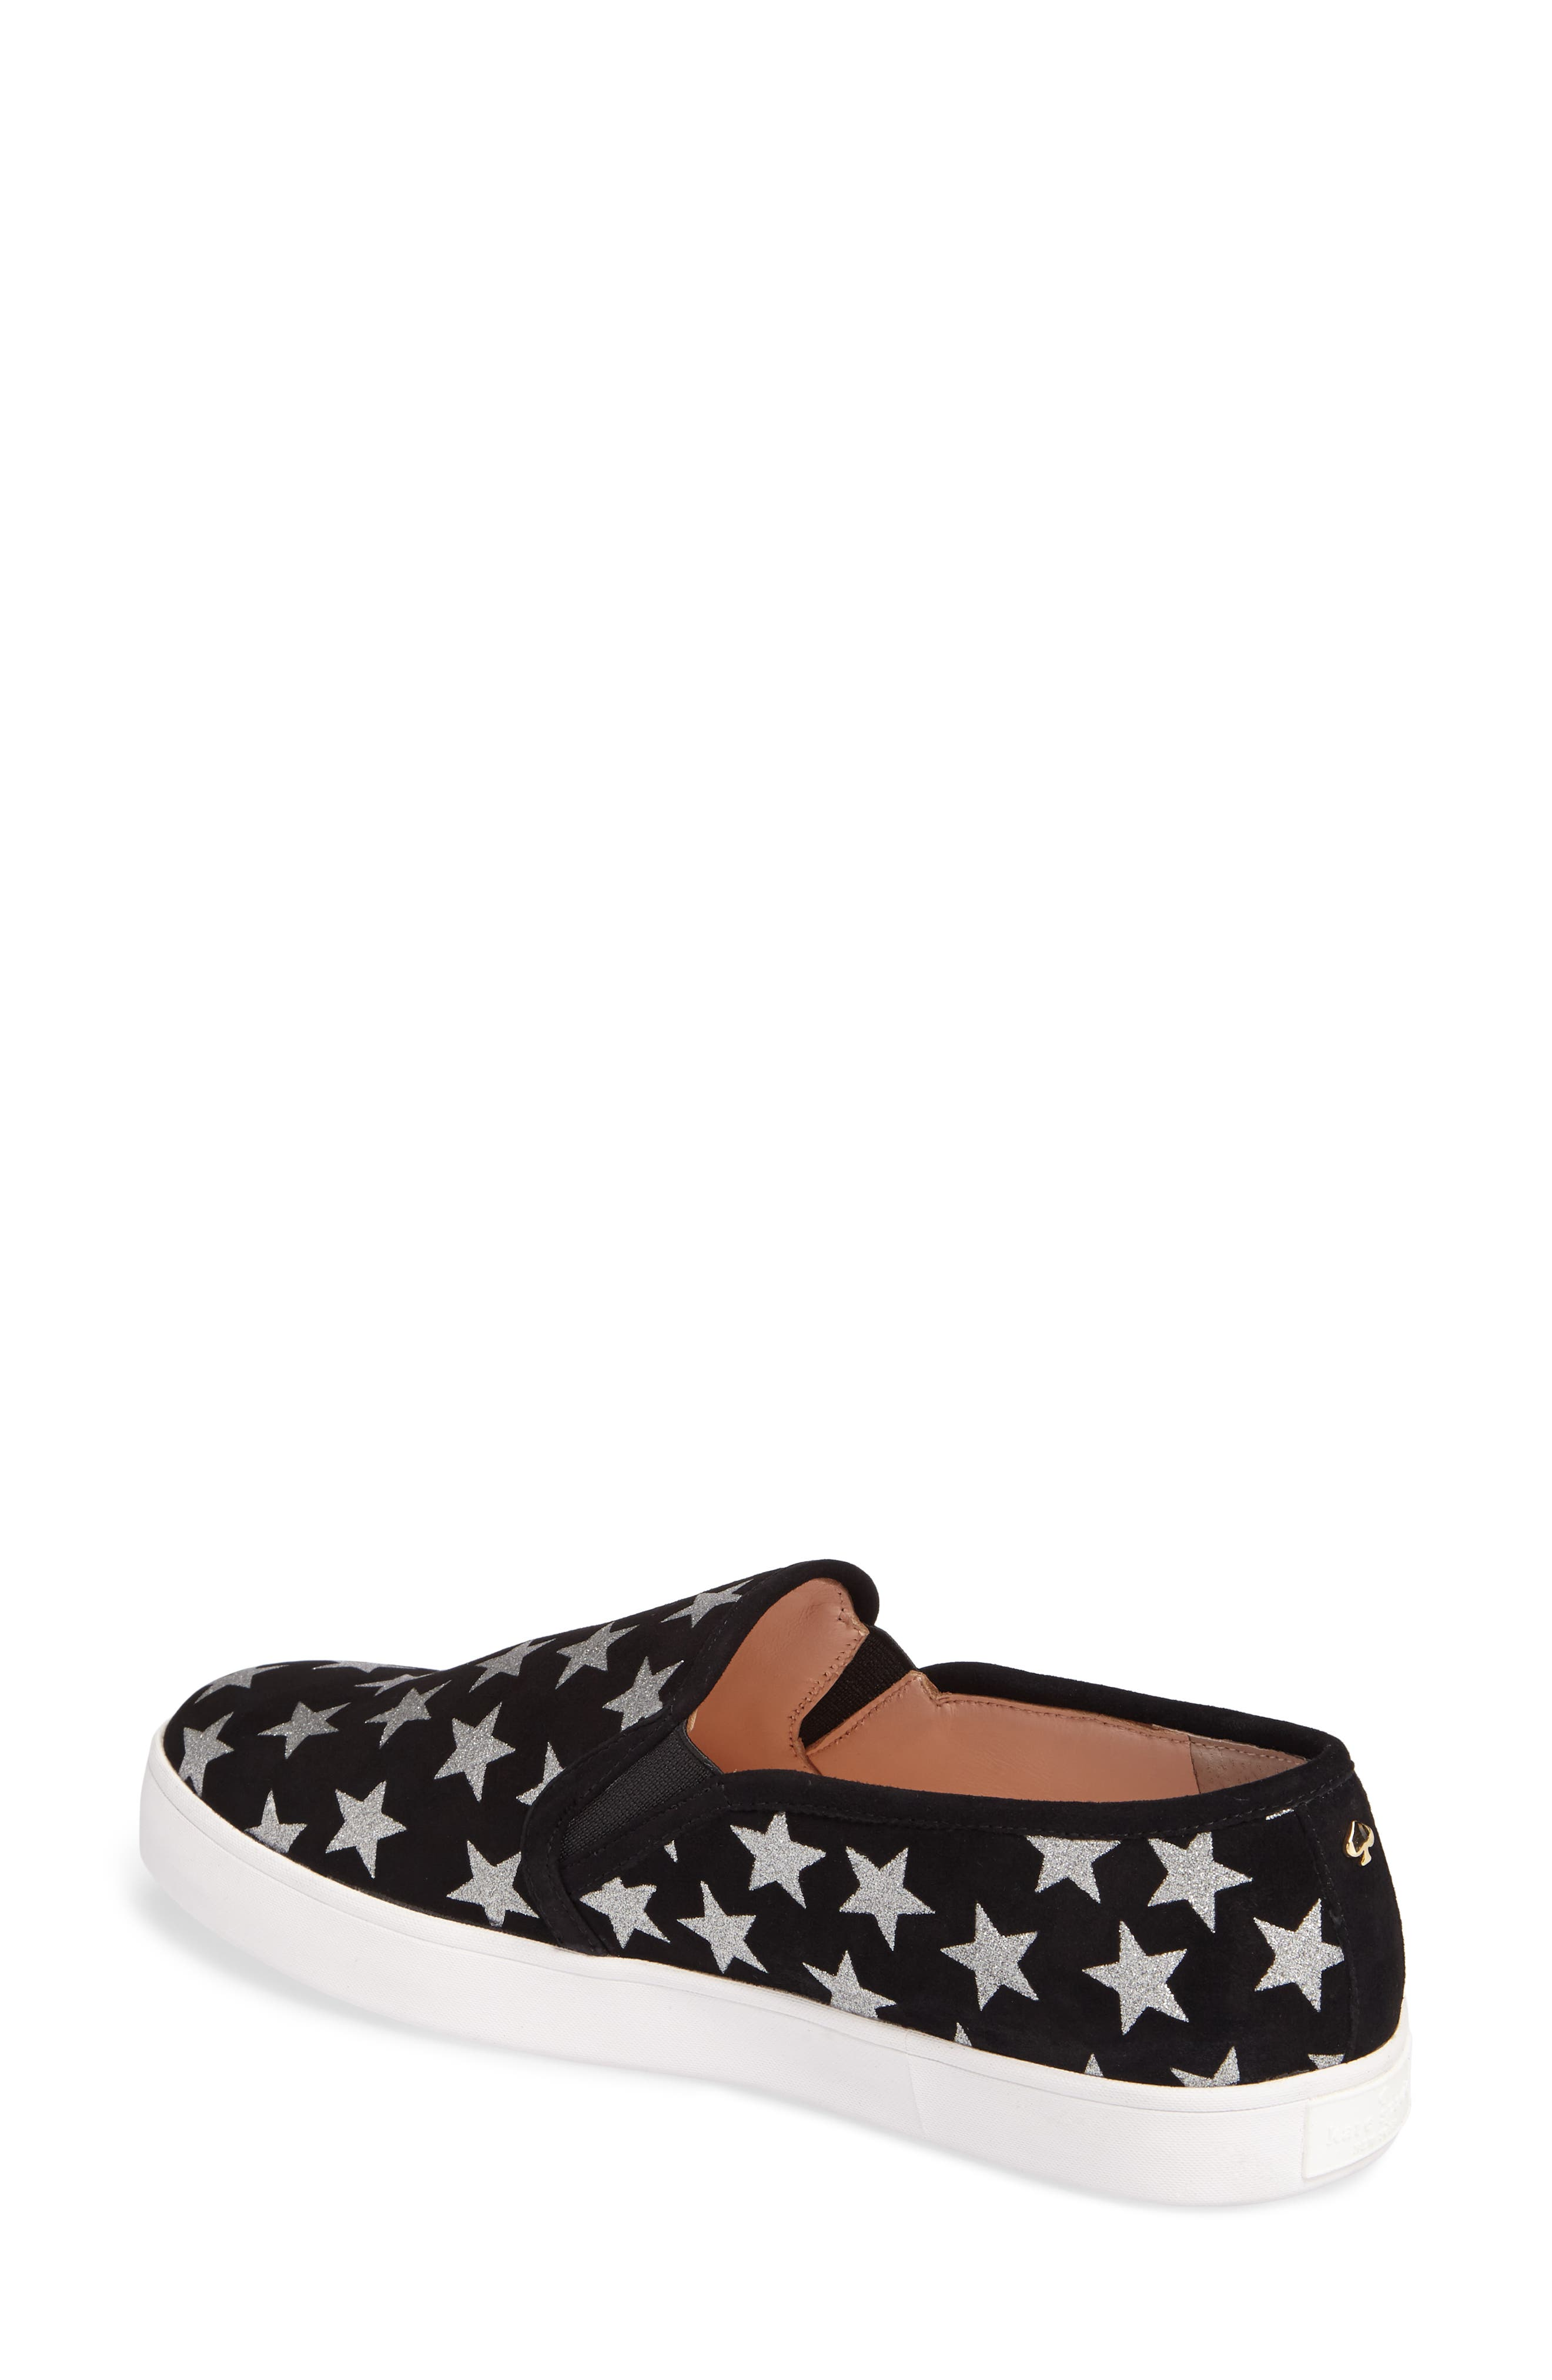 liberty slip-on sneaker,                             Alternate thumbnail 2, color,                             Black/ Silver